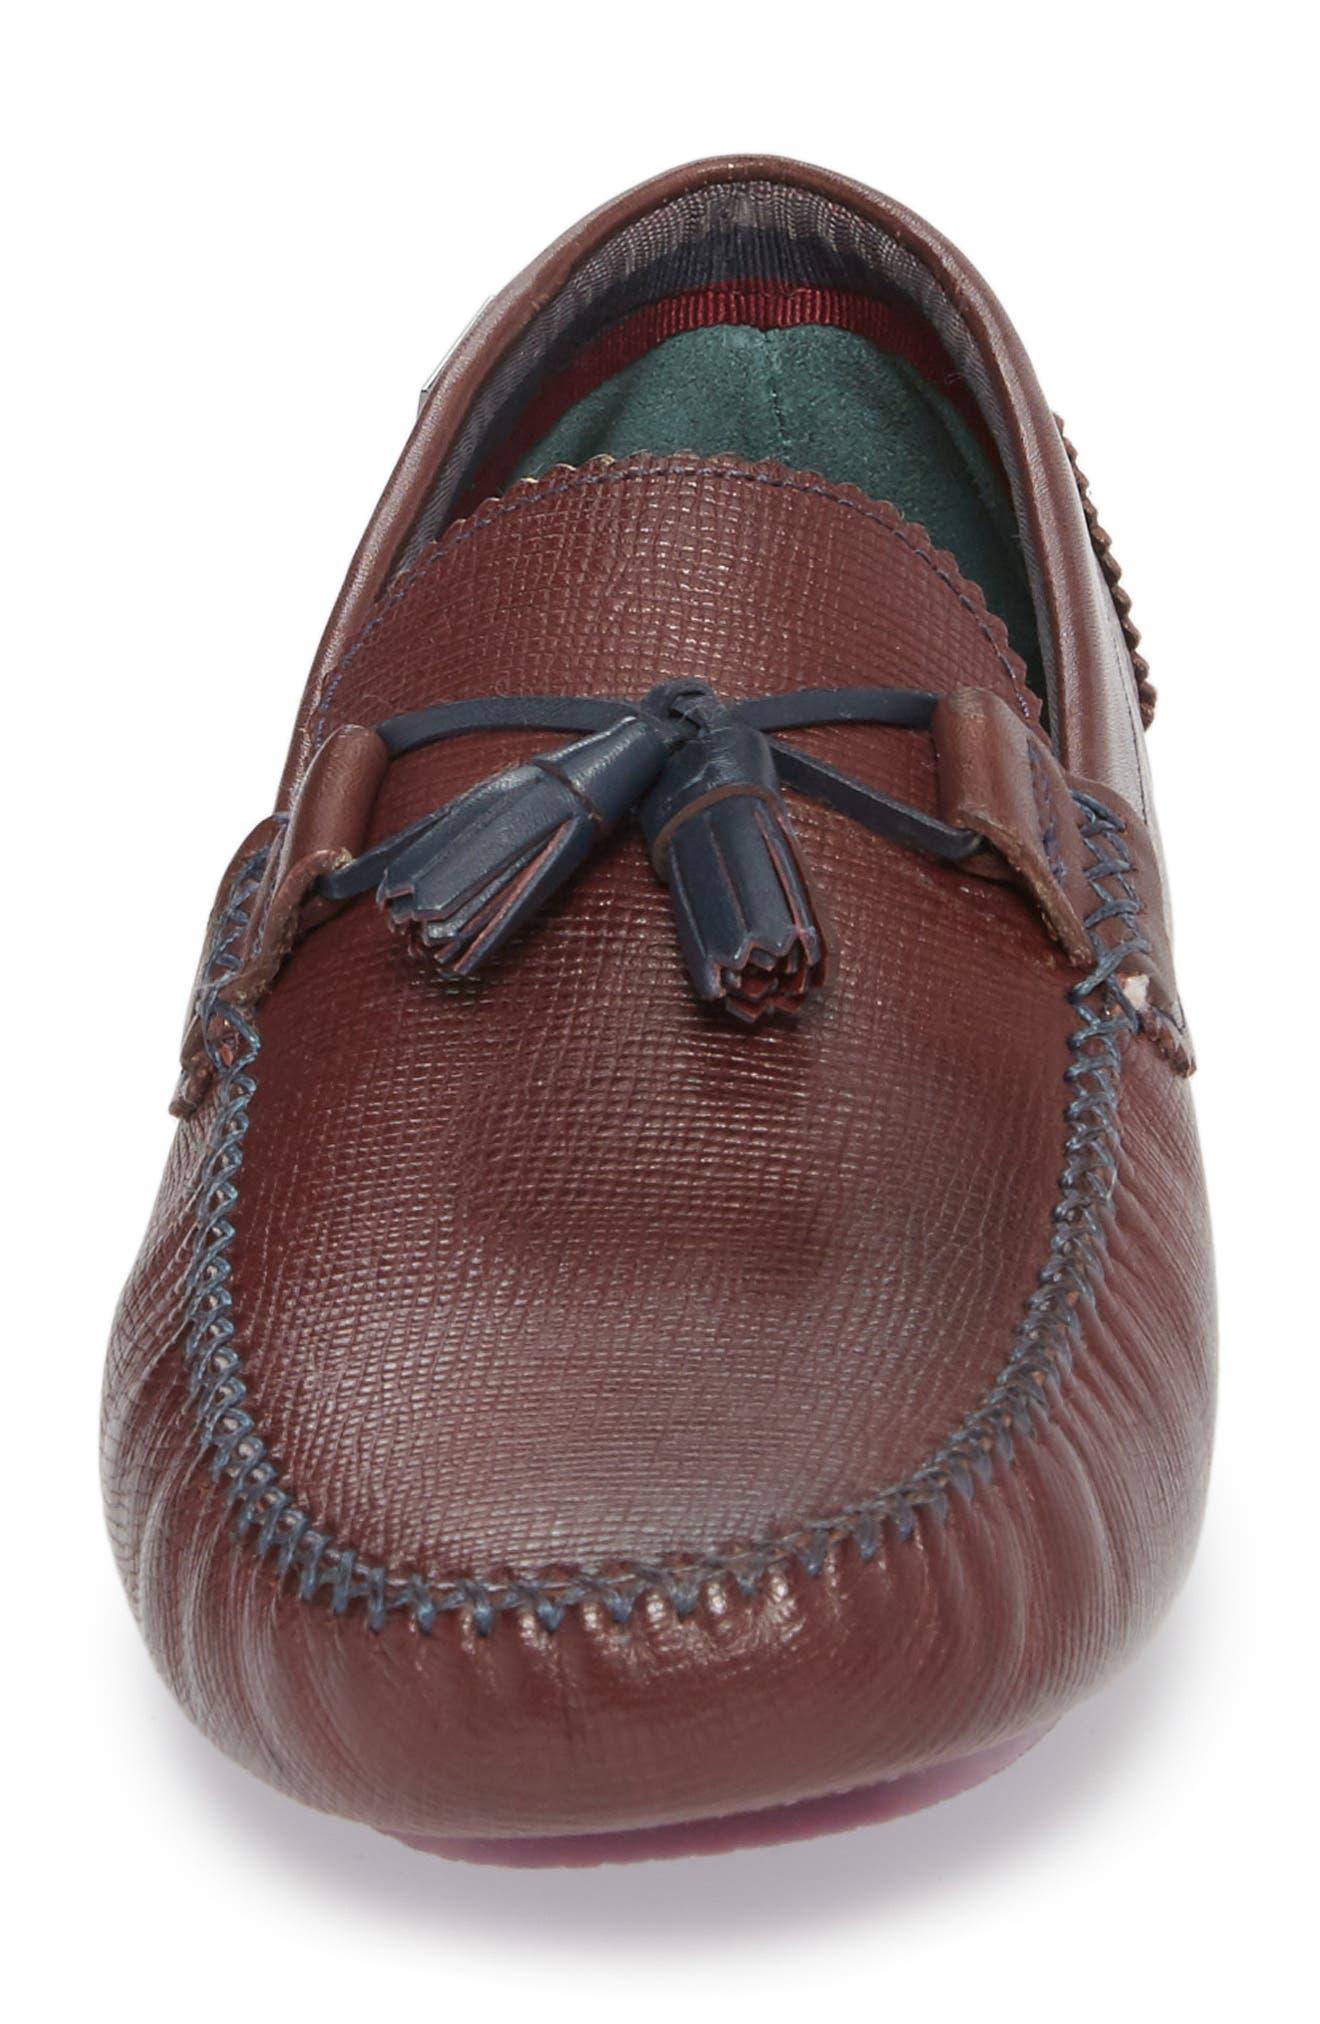 Urbonn Tasseled Driving Loafer,                             Alternate thumbnail 4, color,                             Dark Red Leather